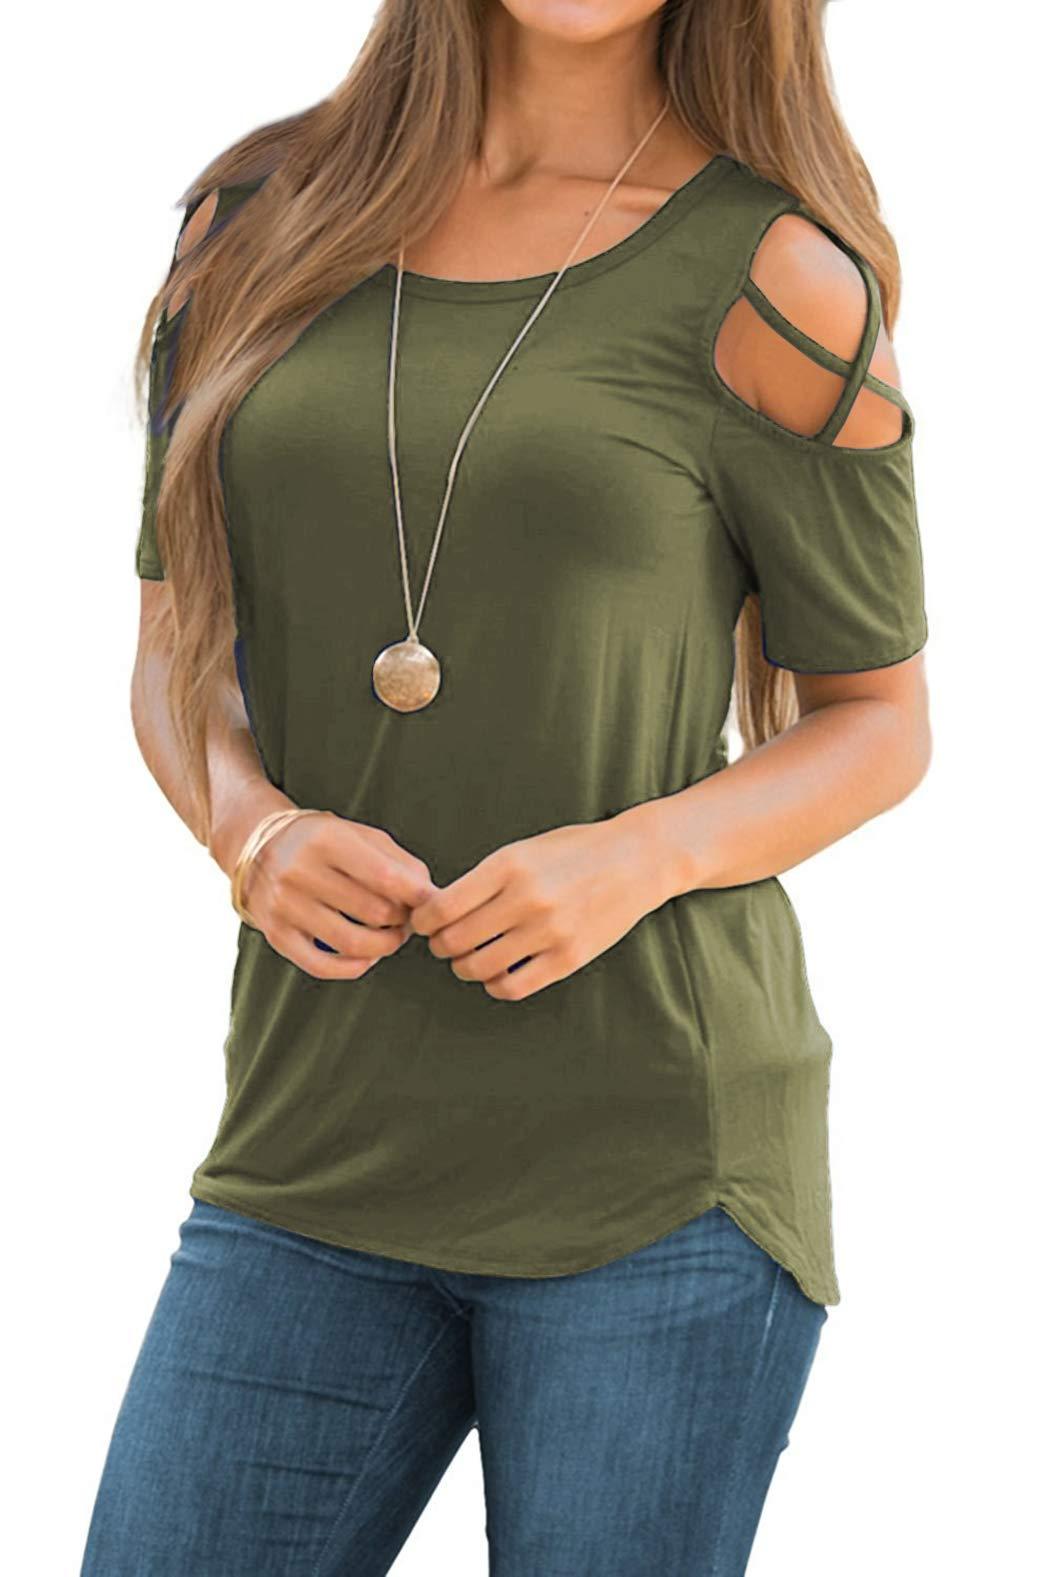 iGENJUN Women Short Sleeve Strappy Cold Shoulder T-Shirt Tops Blouses